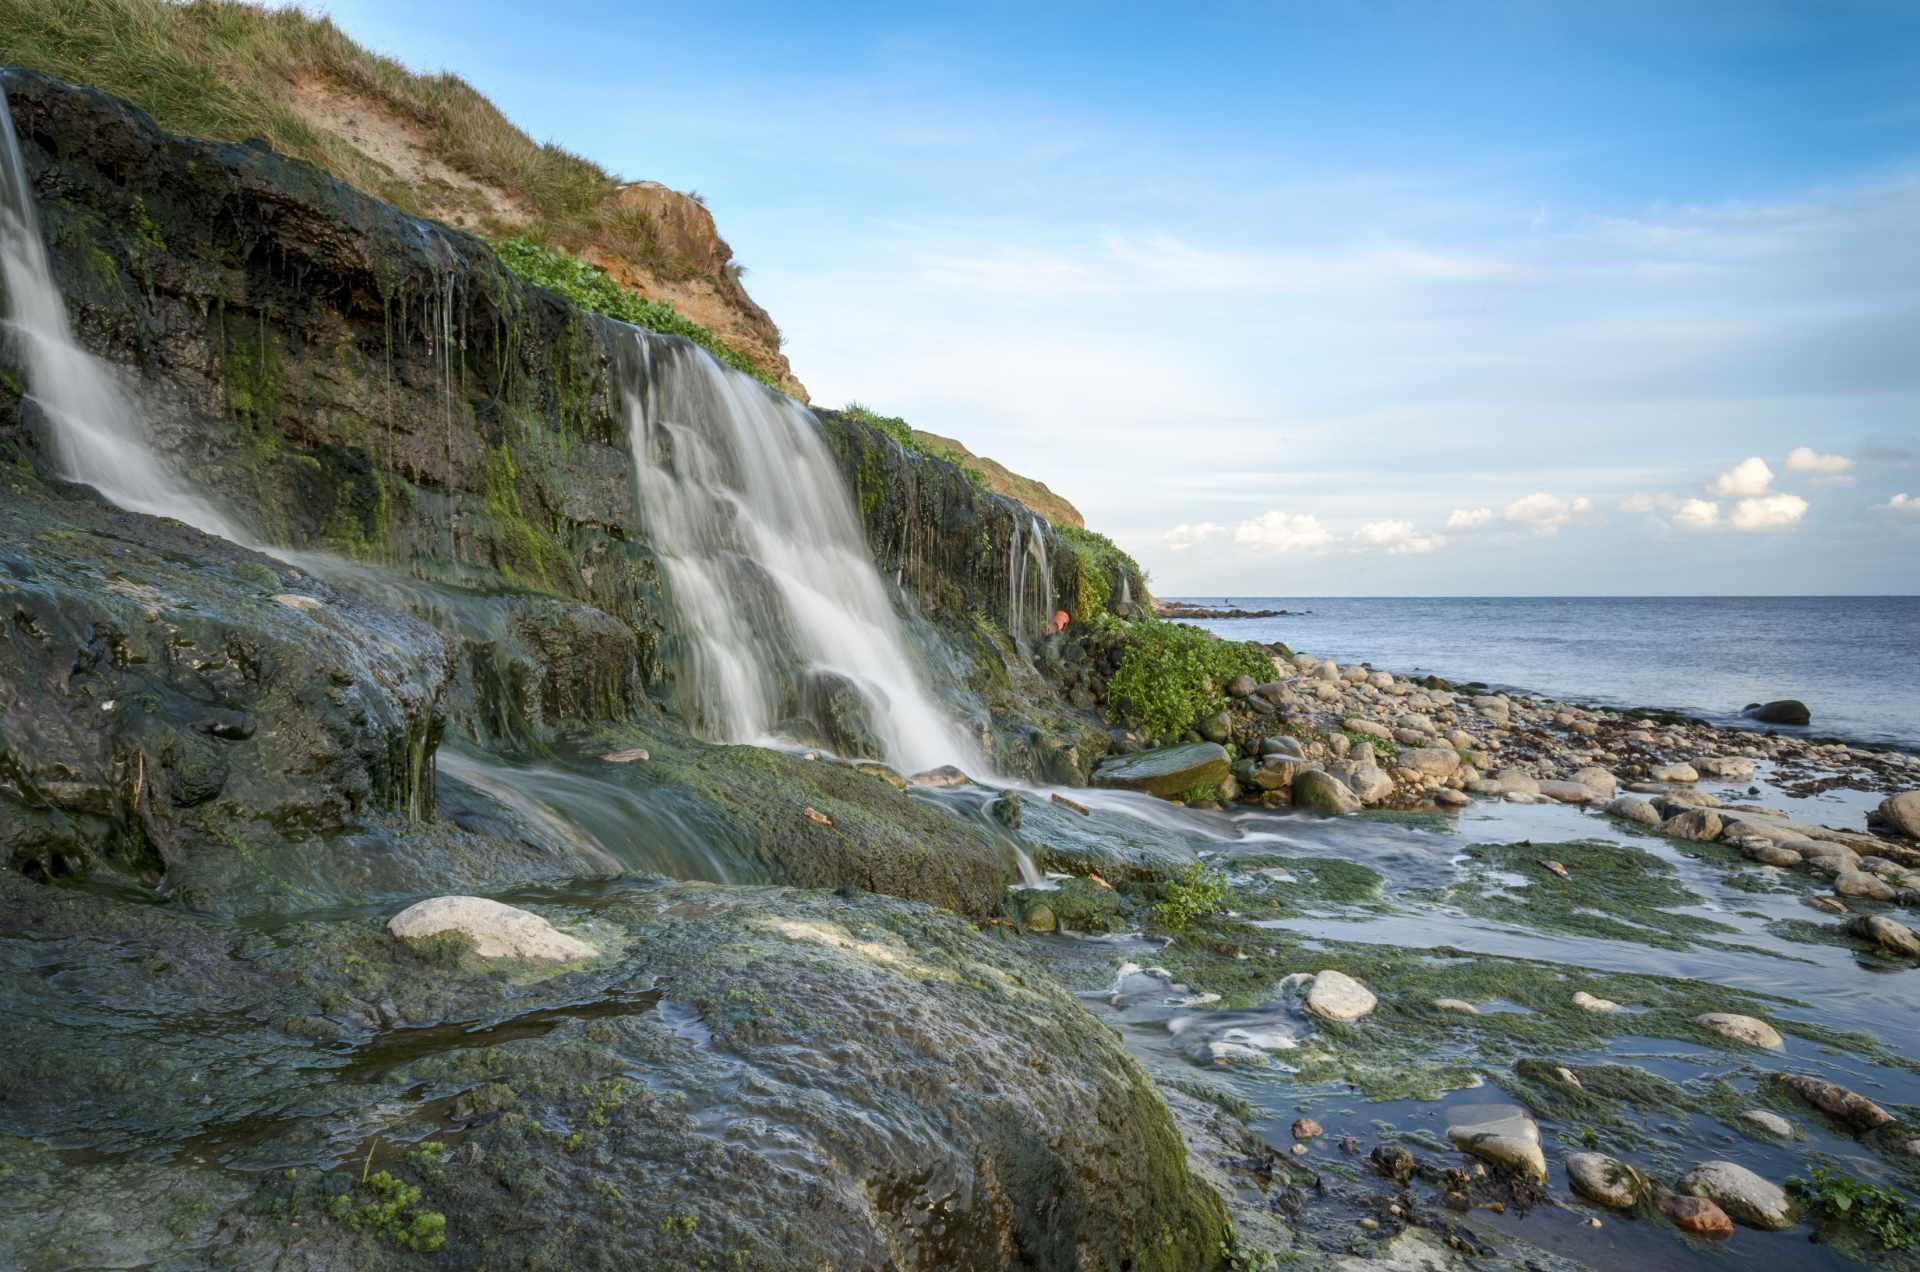 waterfall-going-onto-stony-osmington-mills-beach-best-beaches-in-dorset